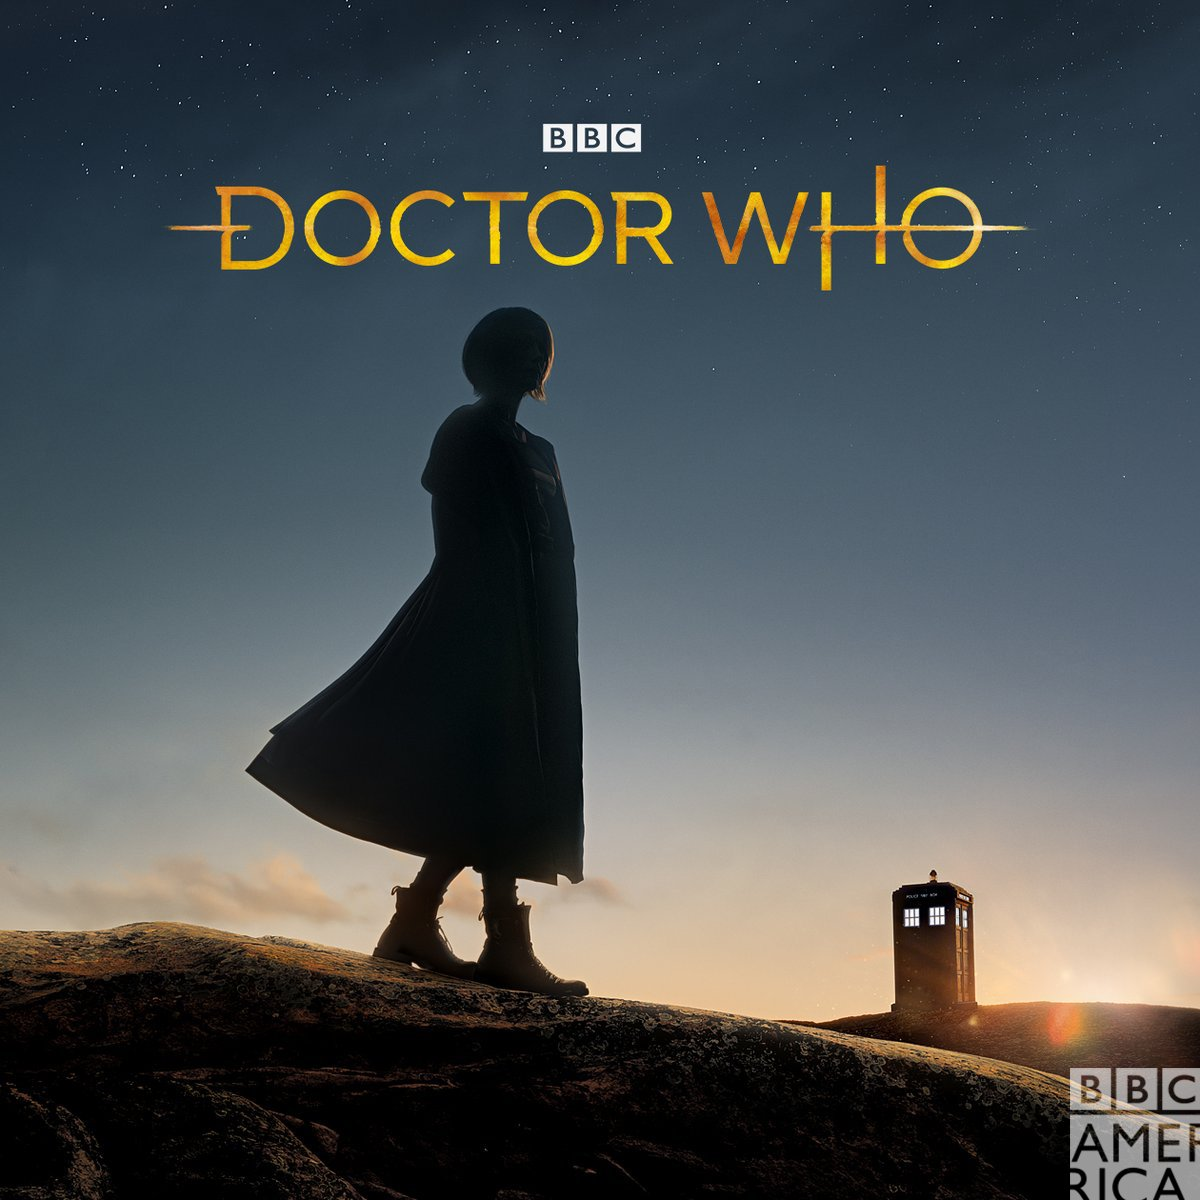 A new era begins #DoctorWho